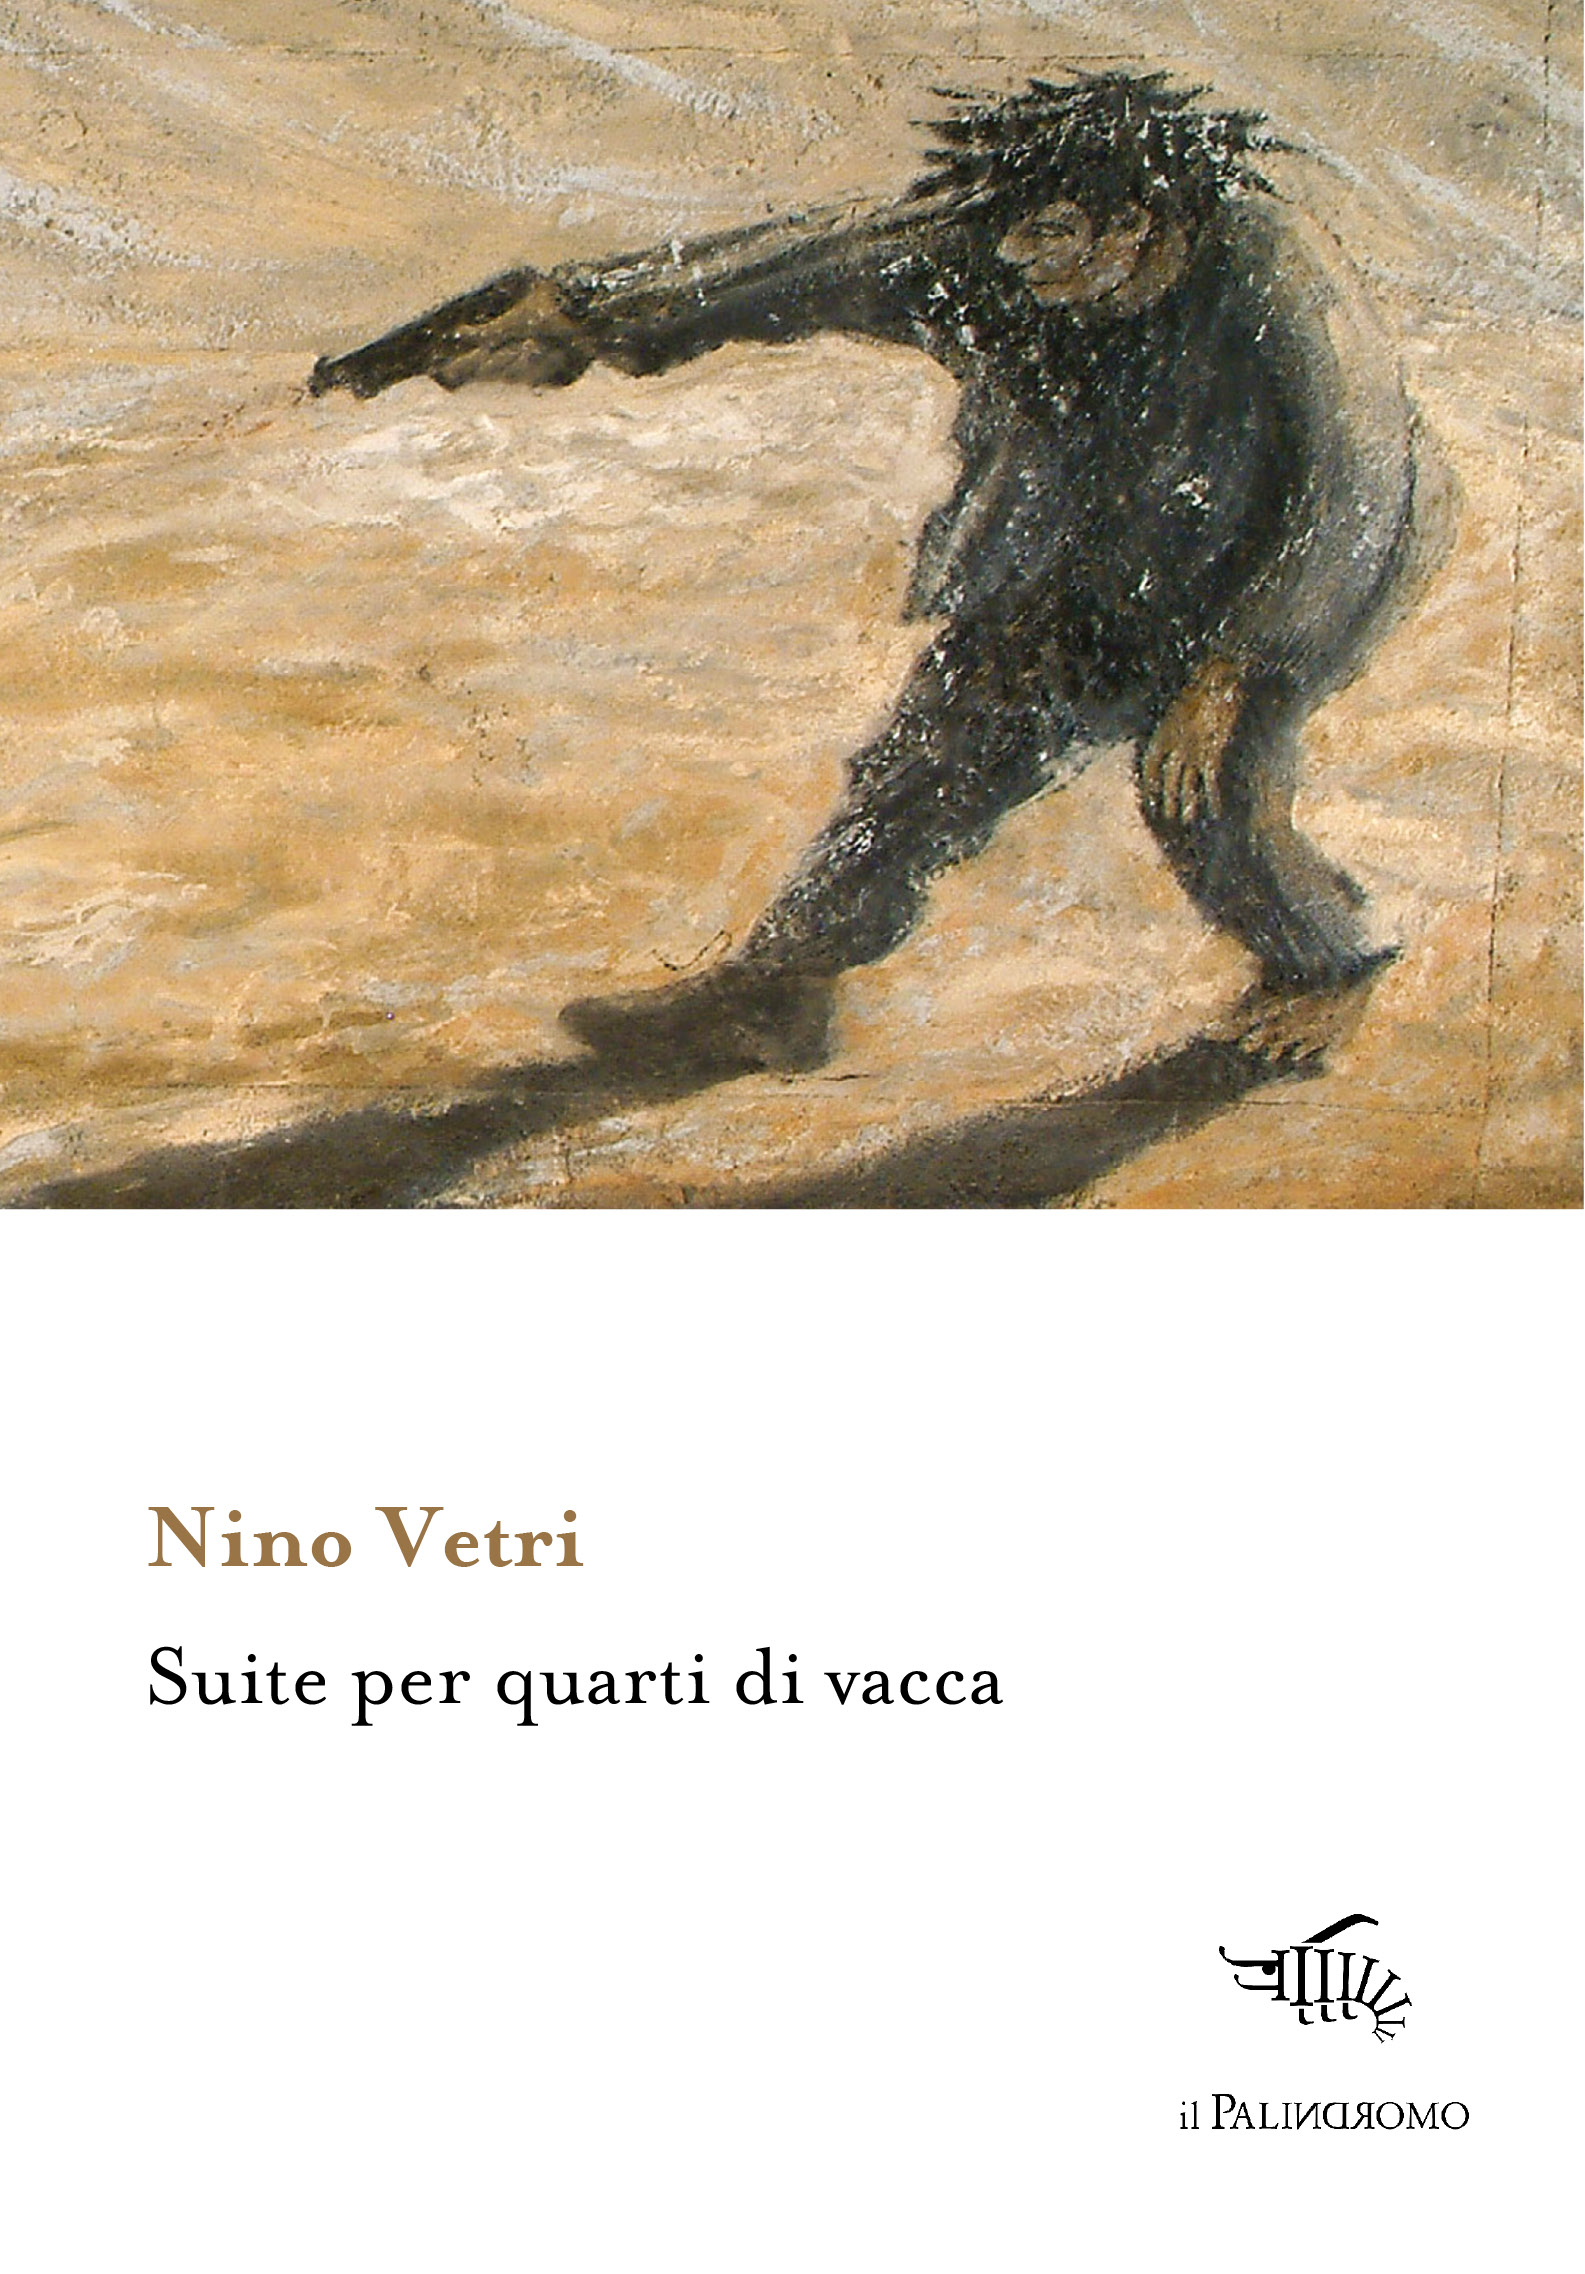 Autore: Nino Vetri